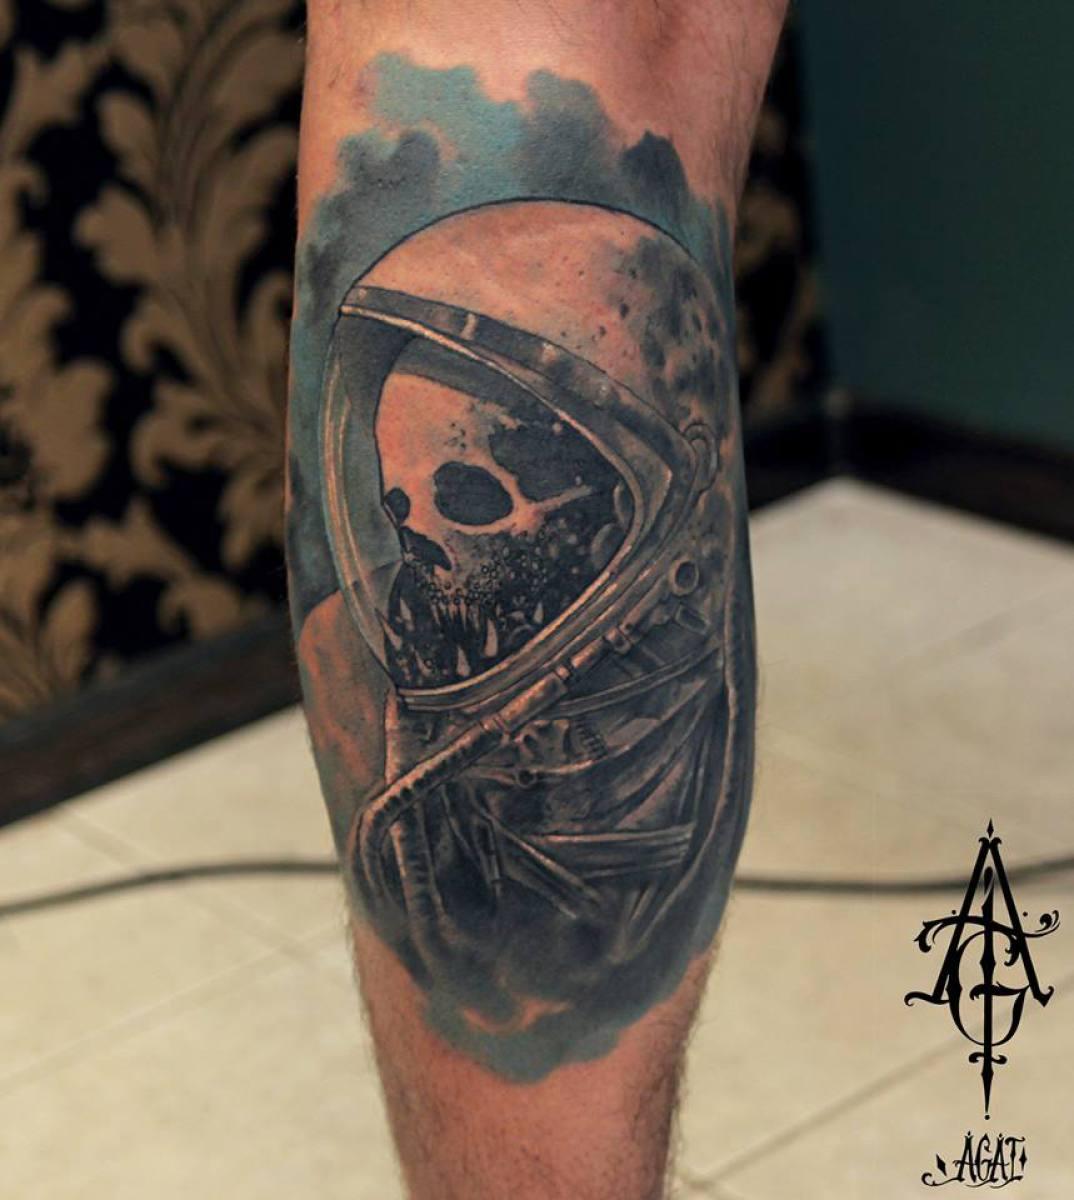 dead astronaut skull tattoo by agat artemji best tattoo ideas gallery. Black Bedroom Furniture Sets. Home Design Ideas